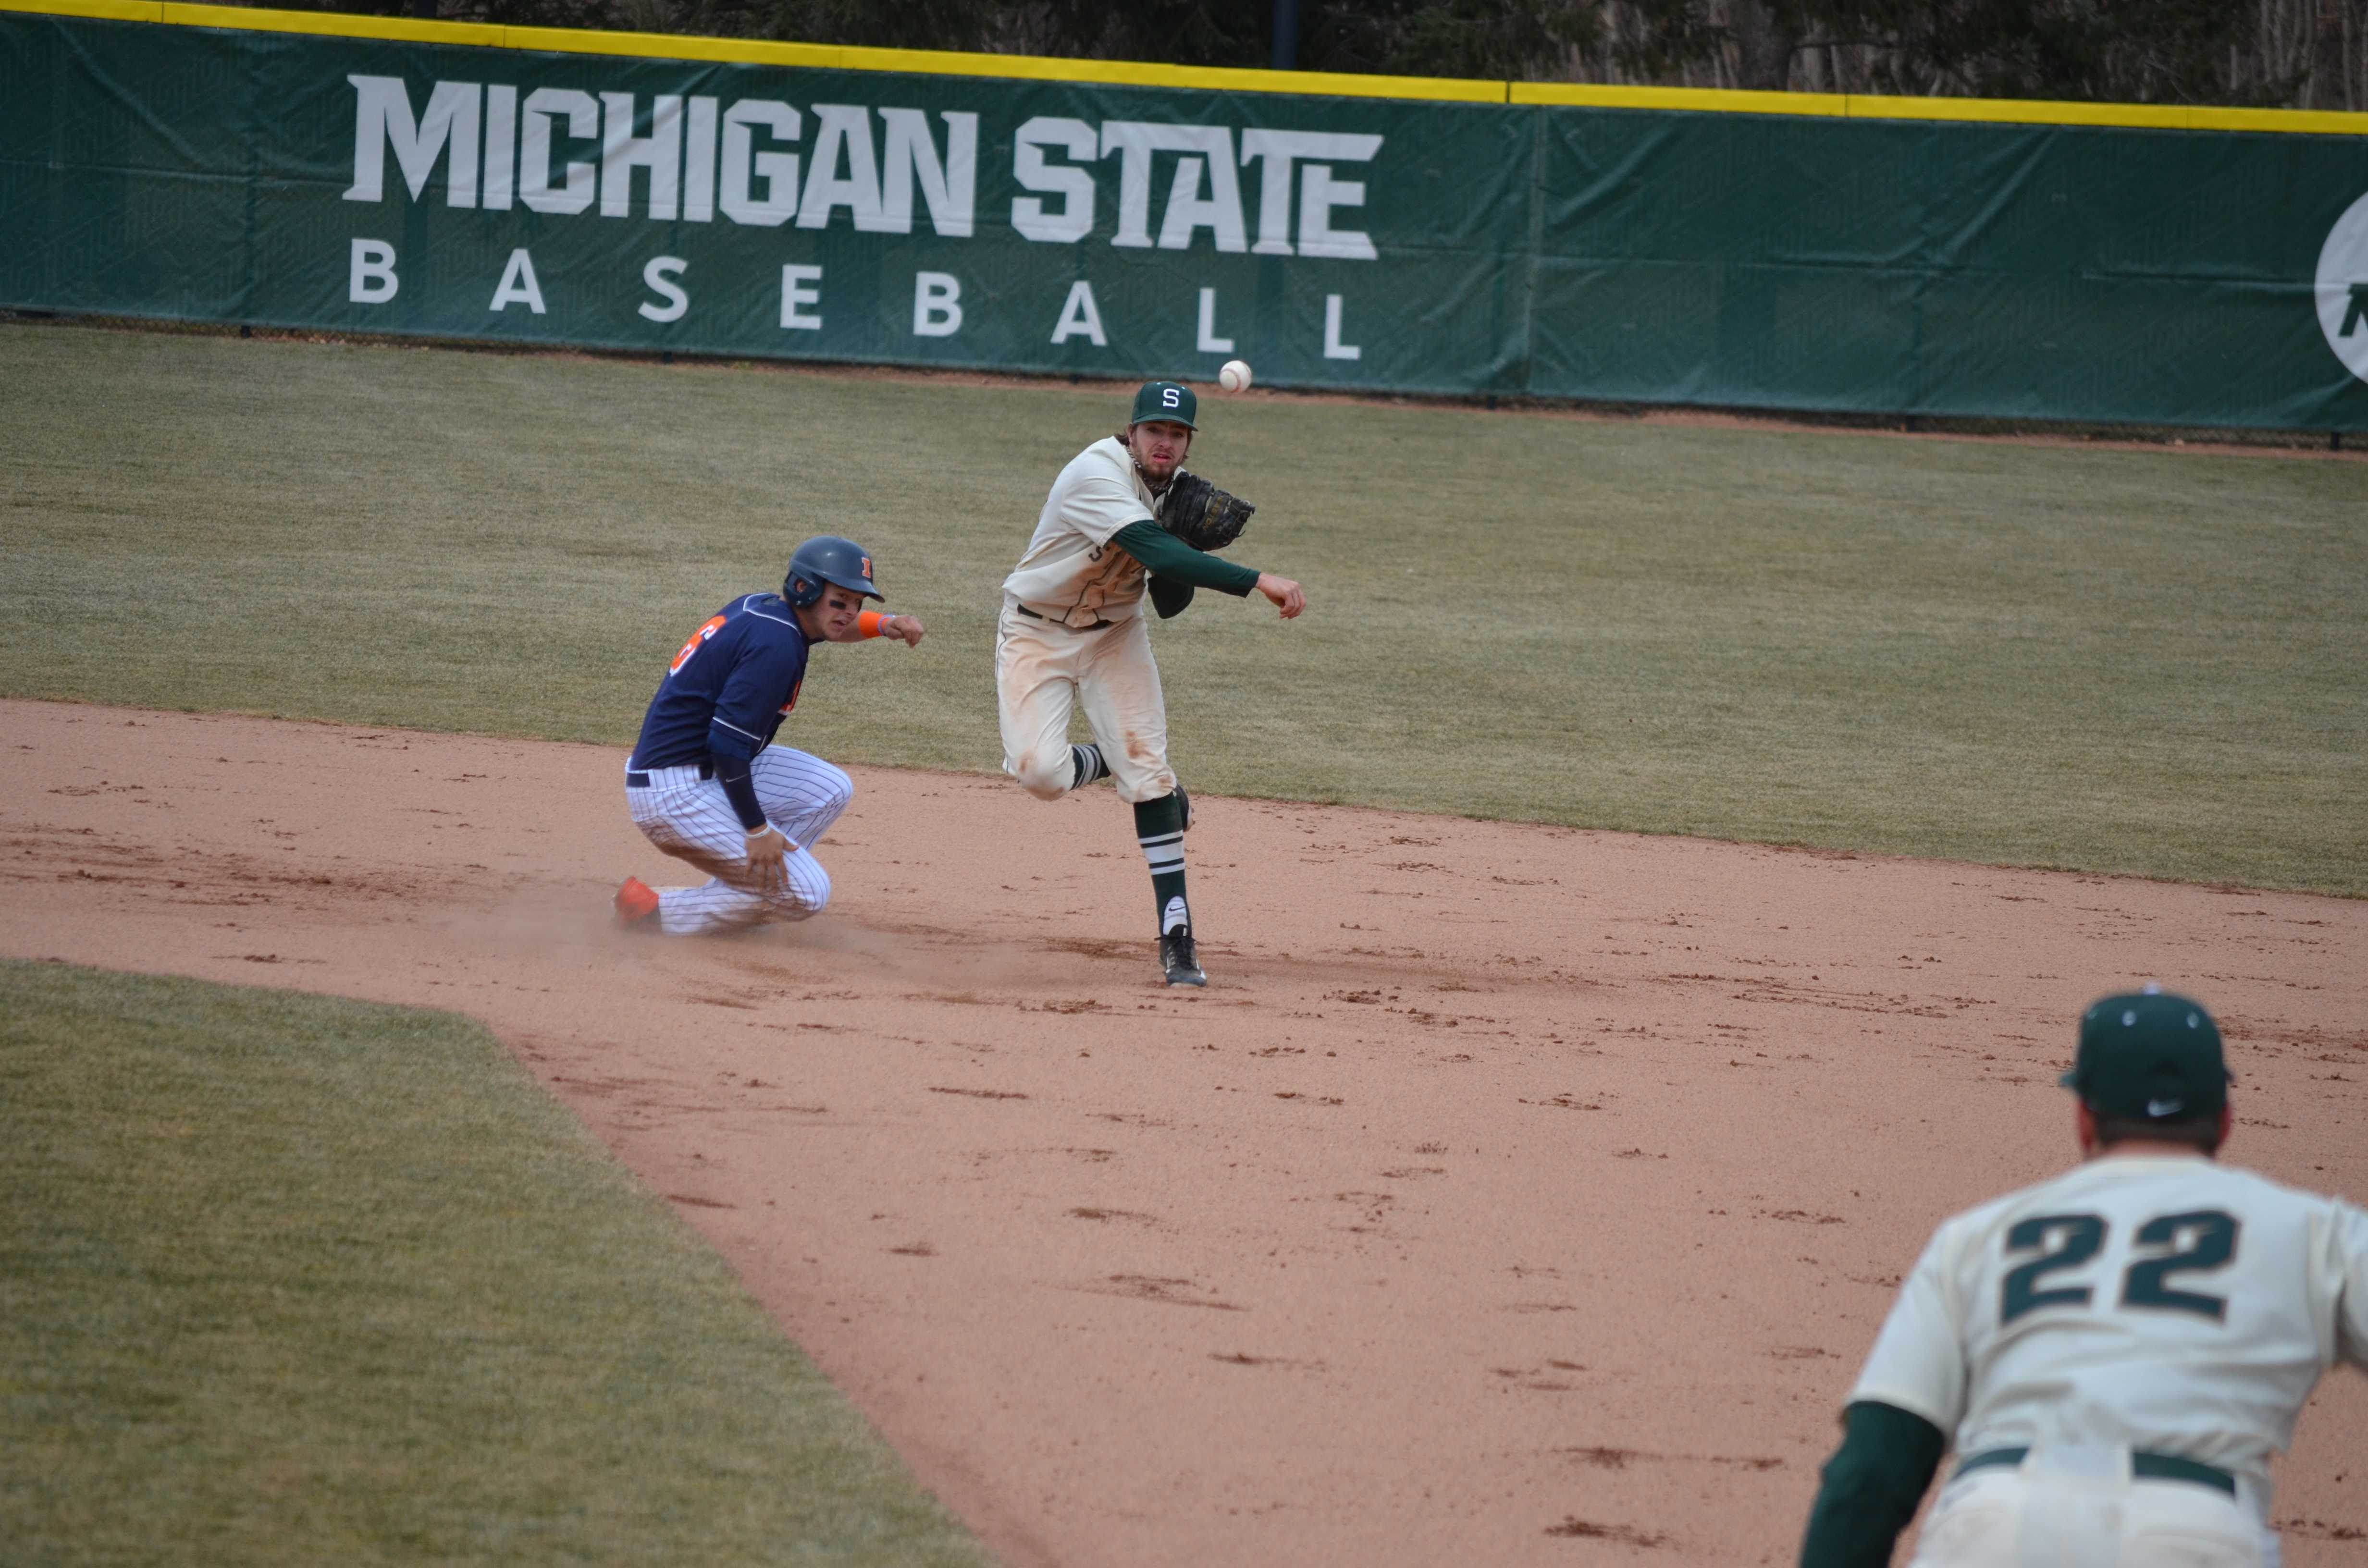 The Pact | Jake Boss Jr. After Baseball's N.J. Sweep